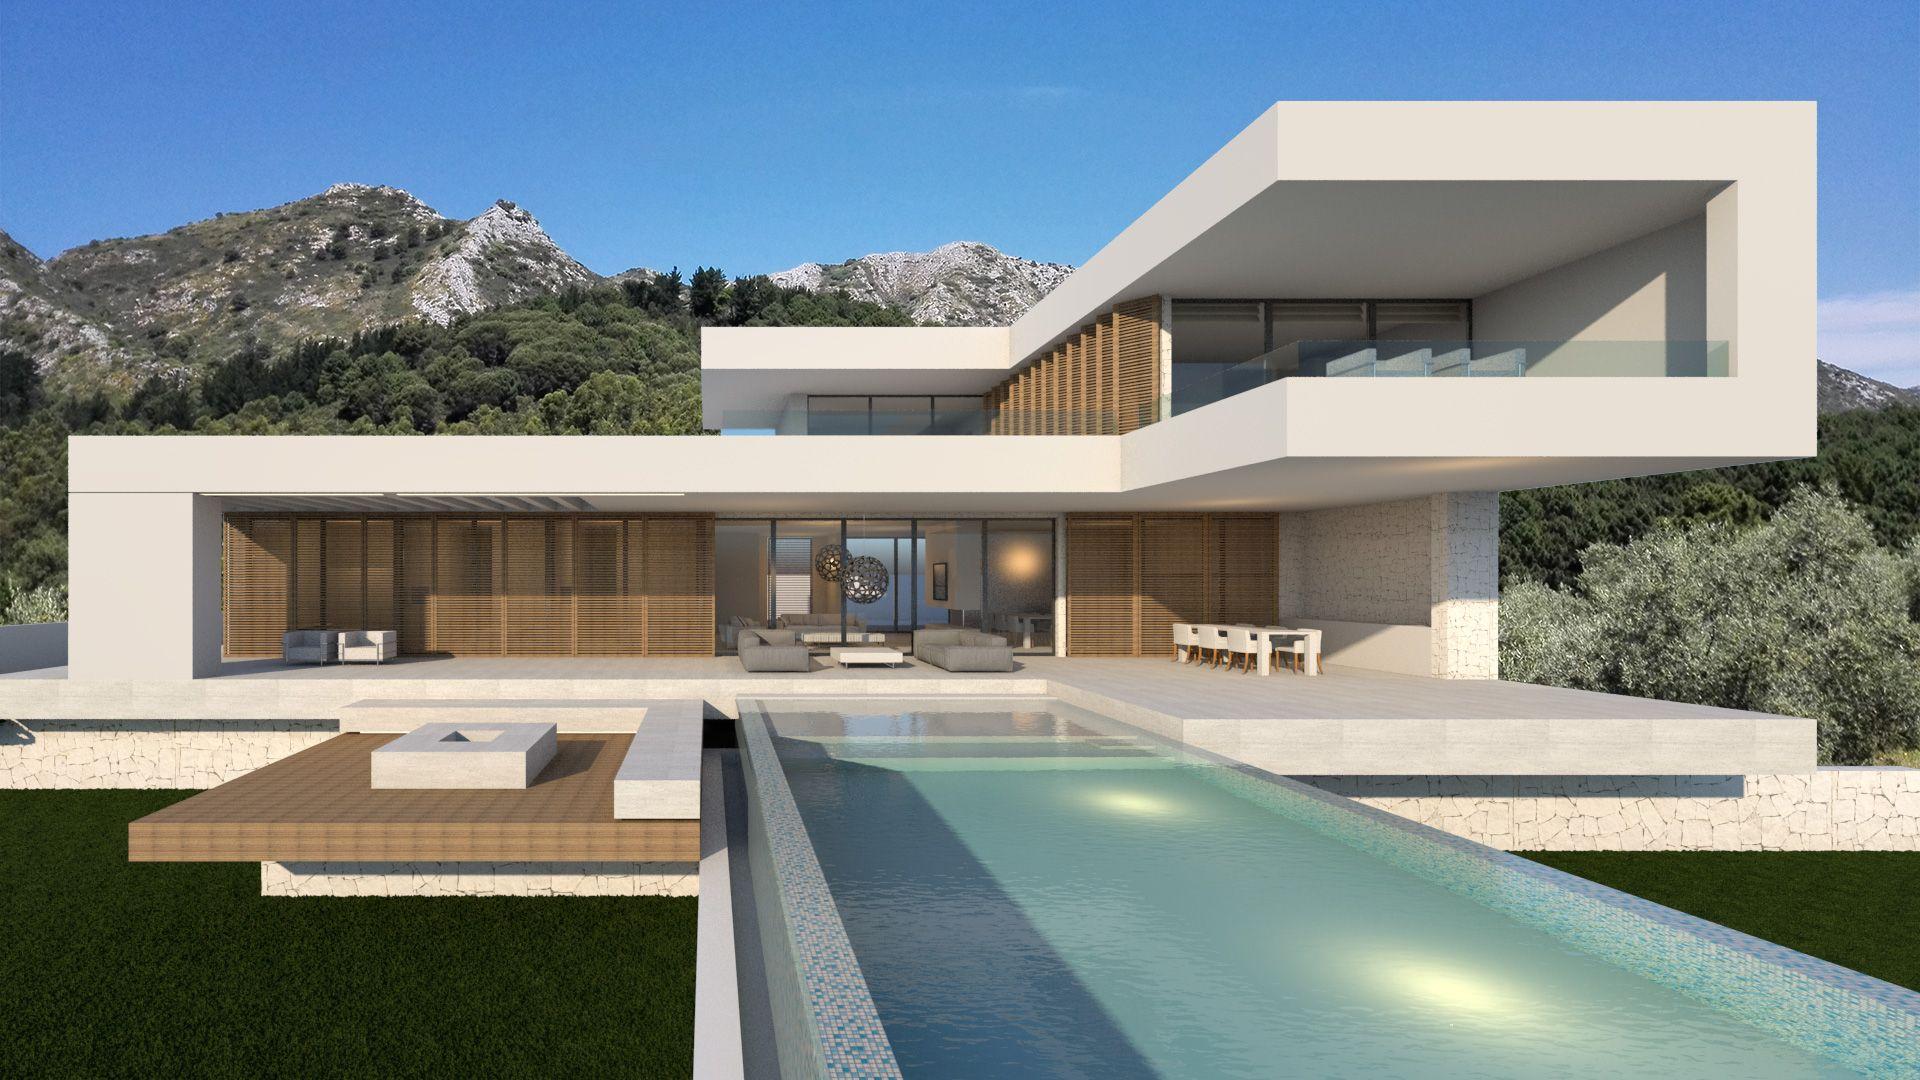 Impressive Contemporary Home Plans 4 Design Home Modern: Flying House Modern Villa Design (3)